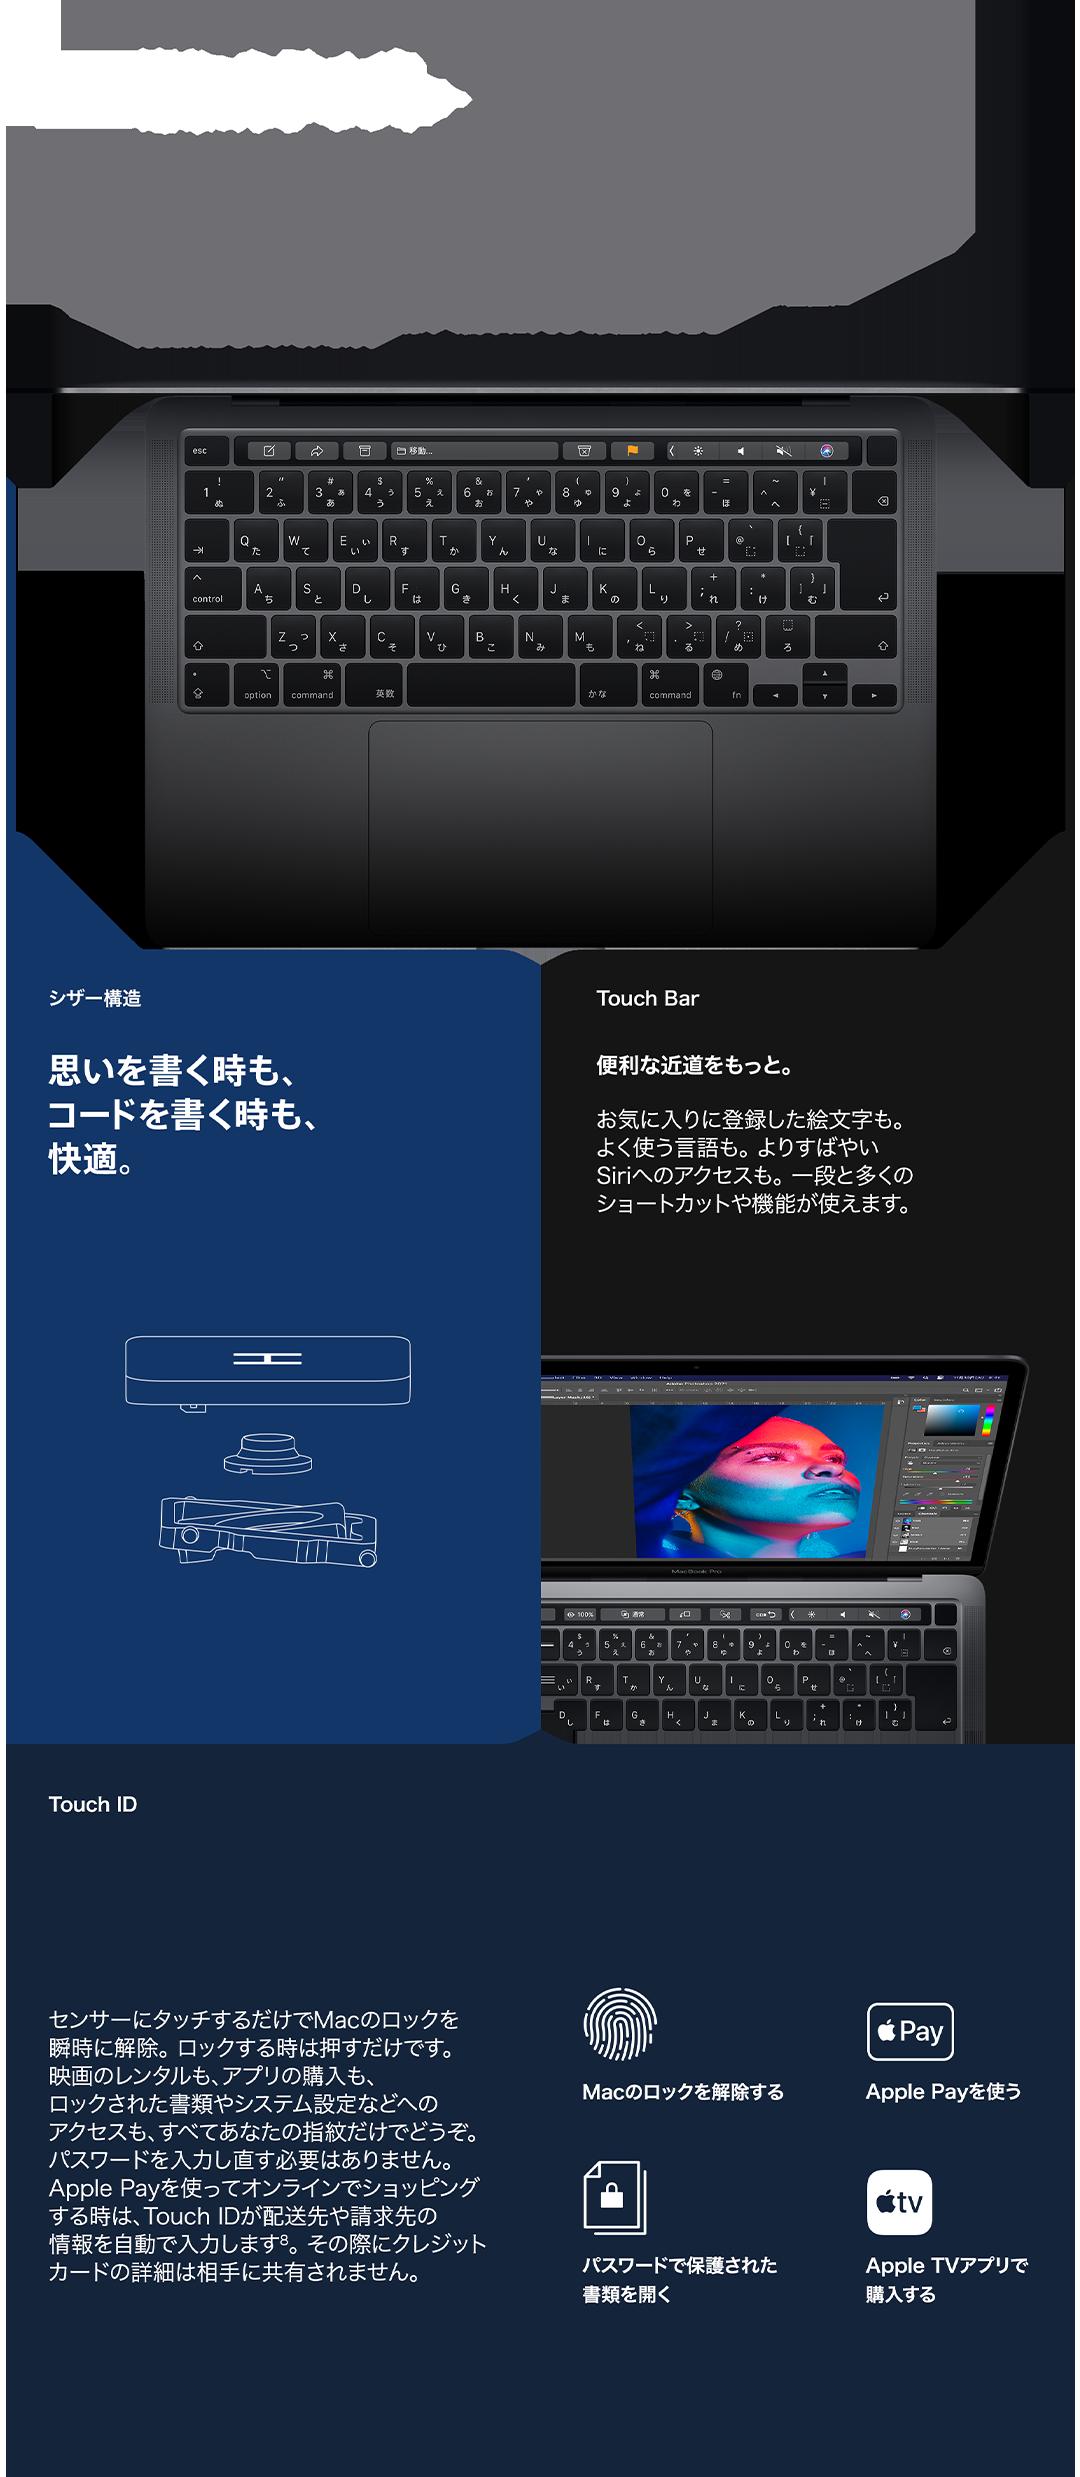 Magic Keyboard 理想のタイプ。